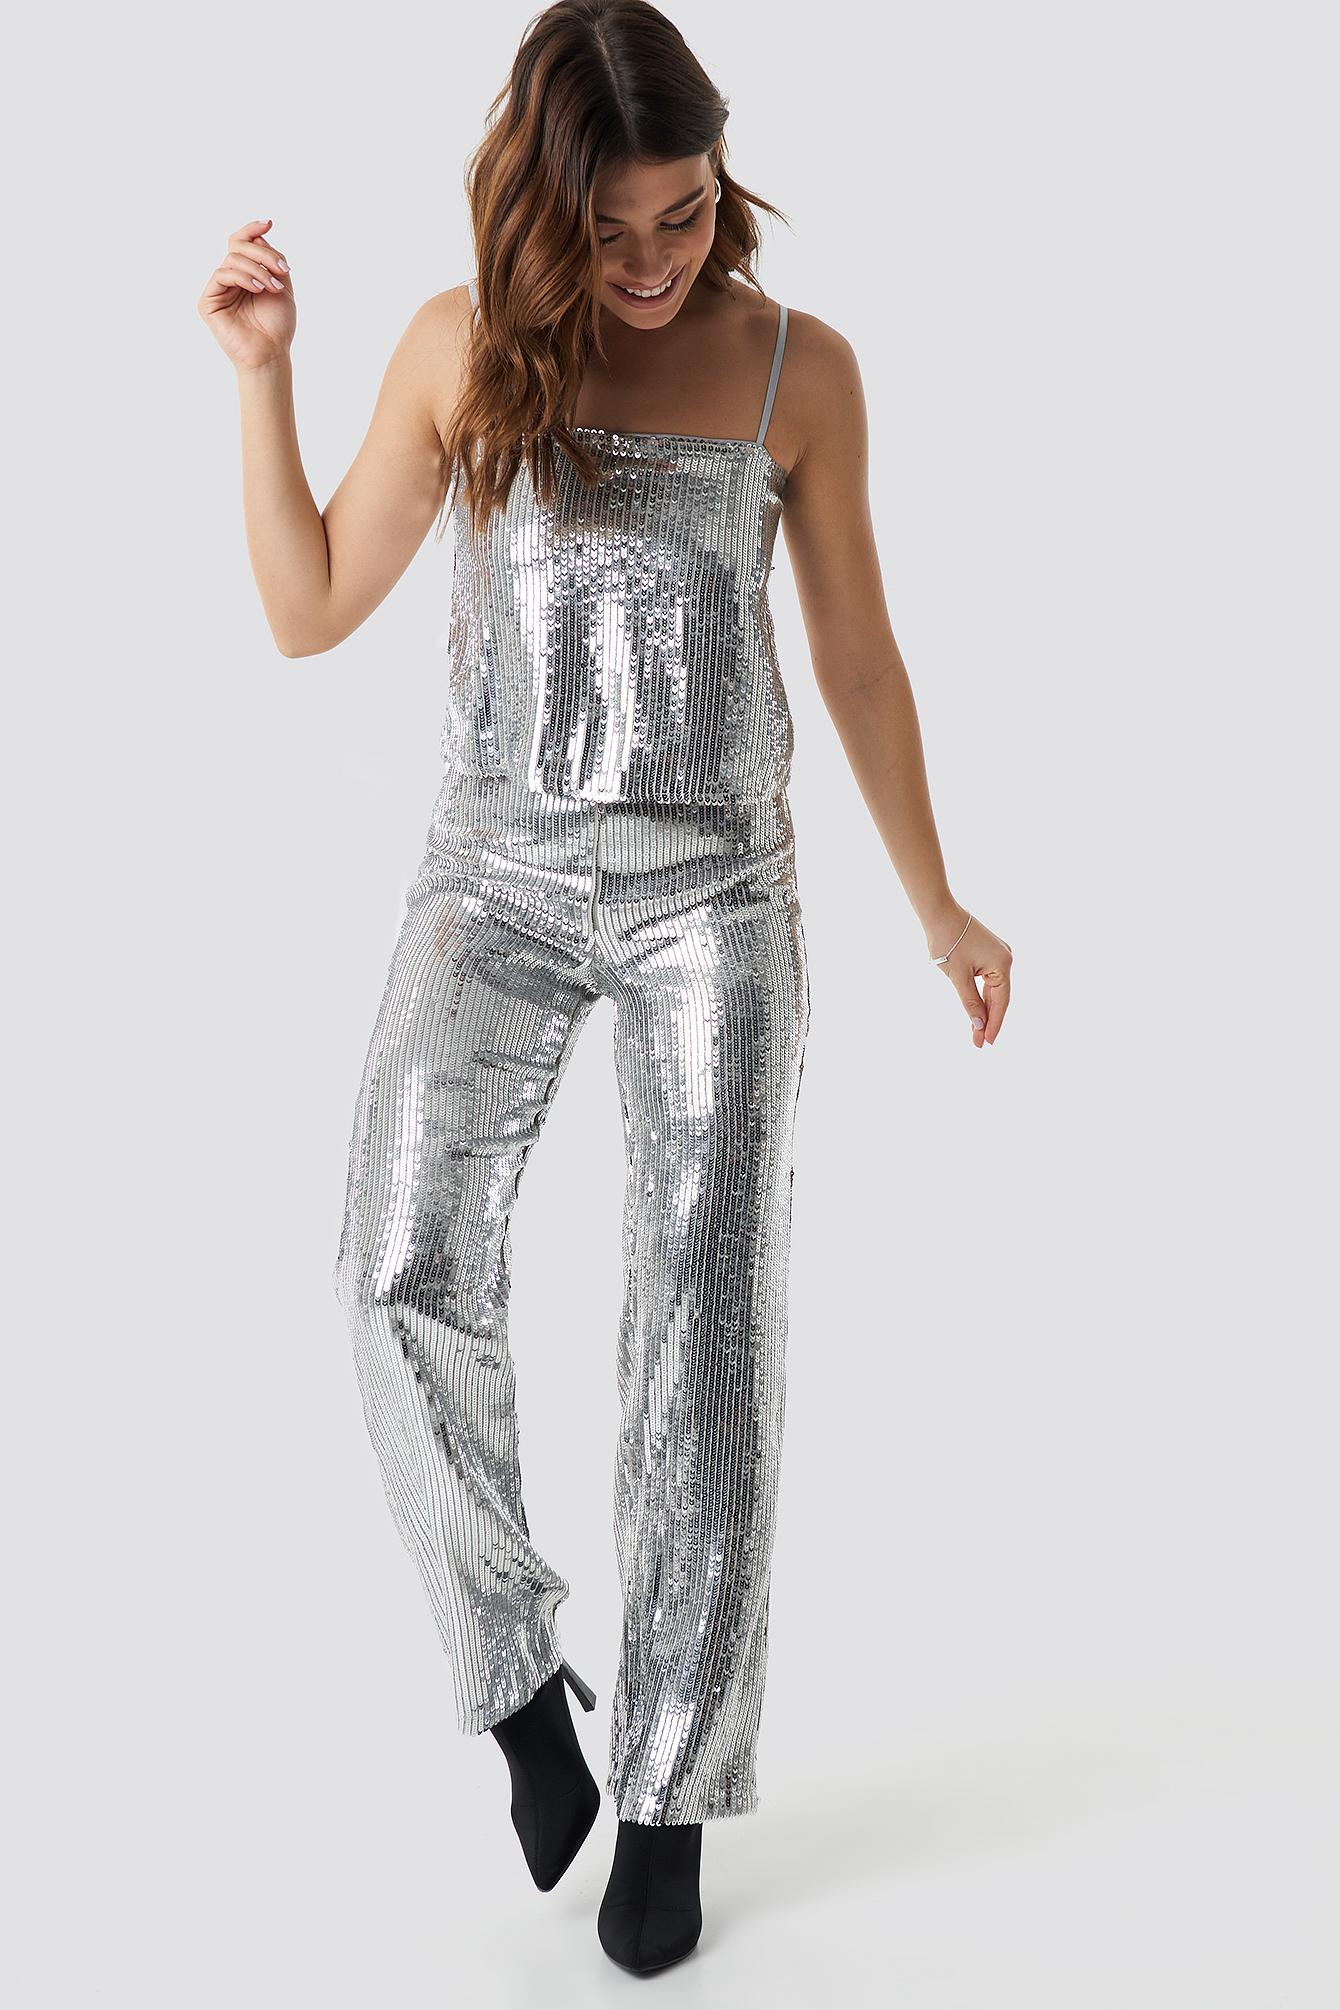 linn ahlborg x na-kd -  Sparkle Striped Flared Pants - Silver